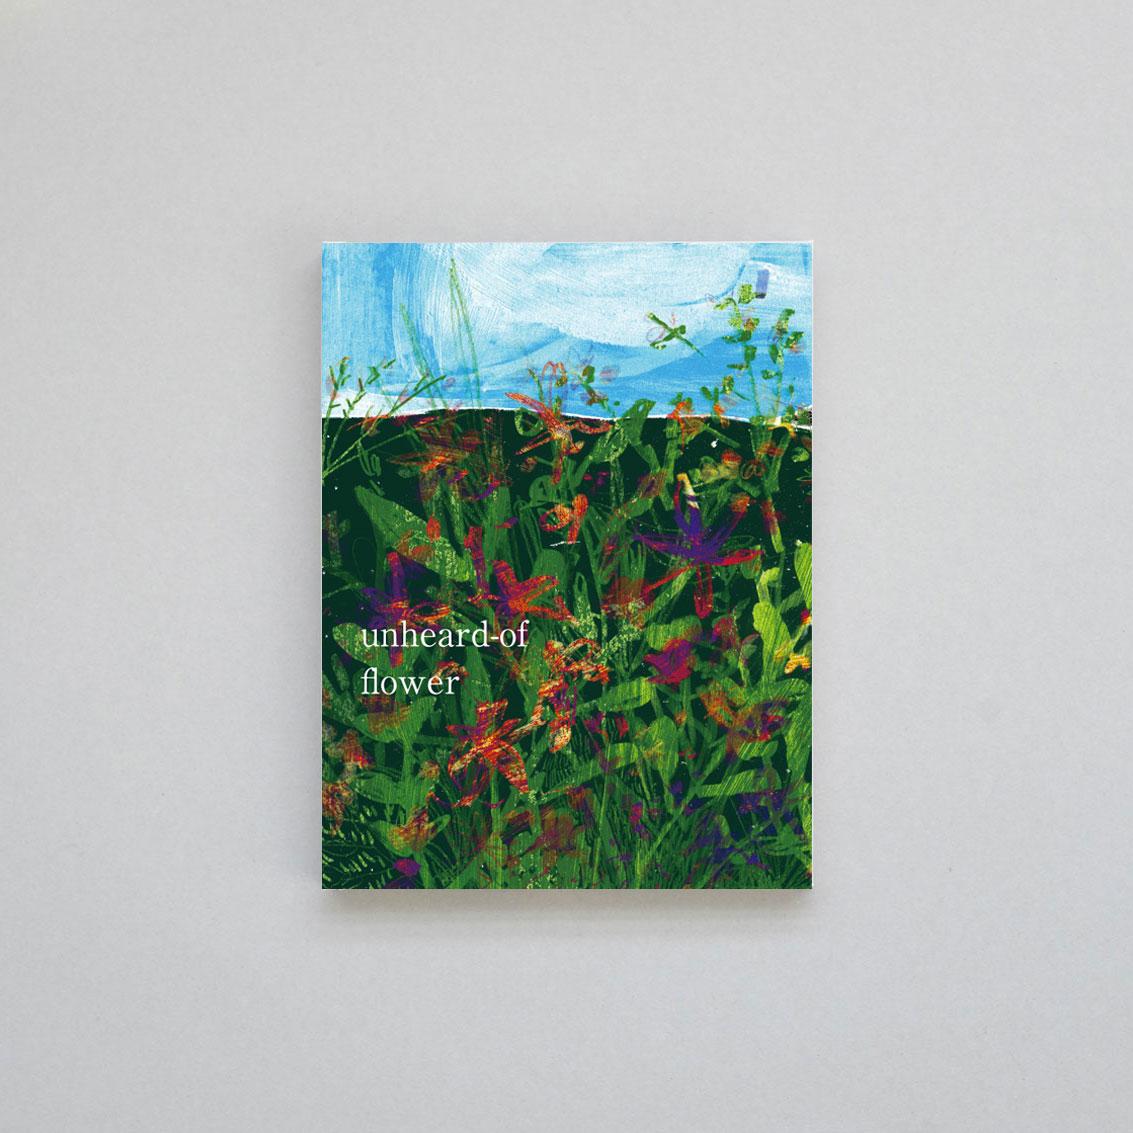 Unheard-of flower